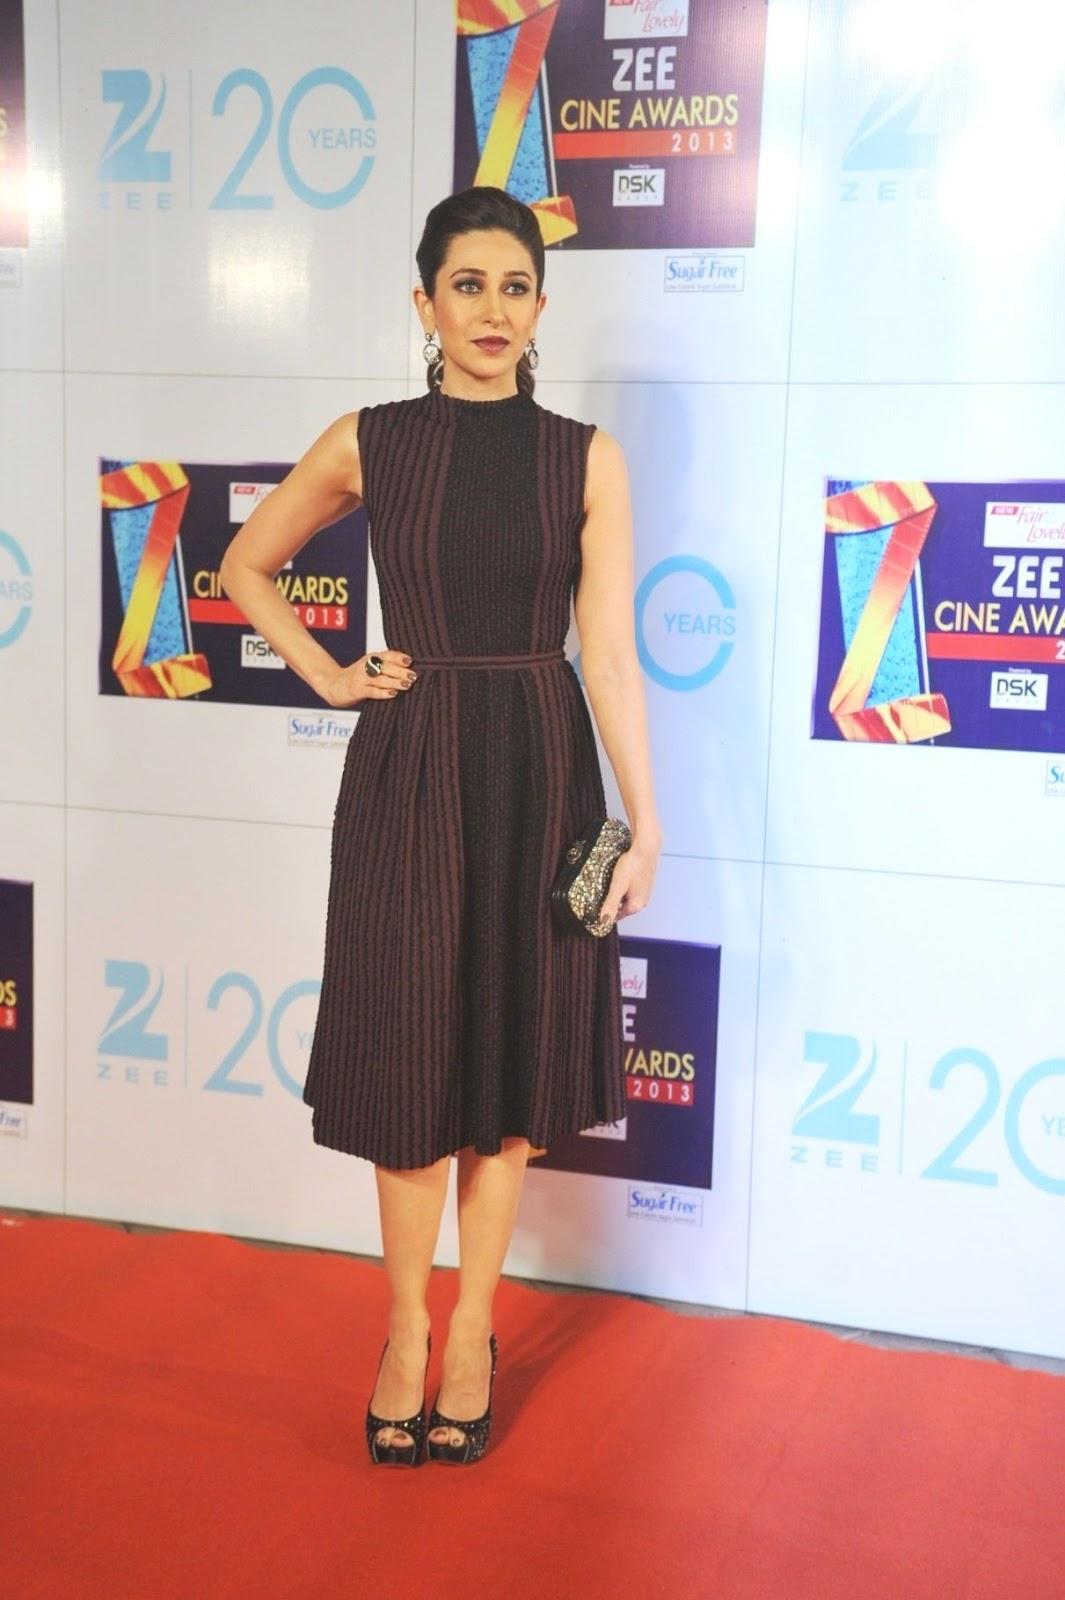 Mallaika arrora khan and karishma kapoor at zee cine awards 2013.